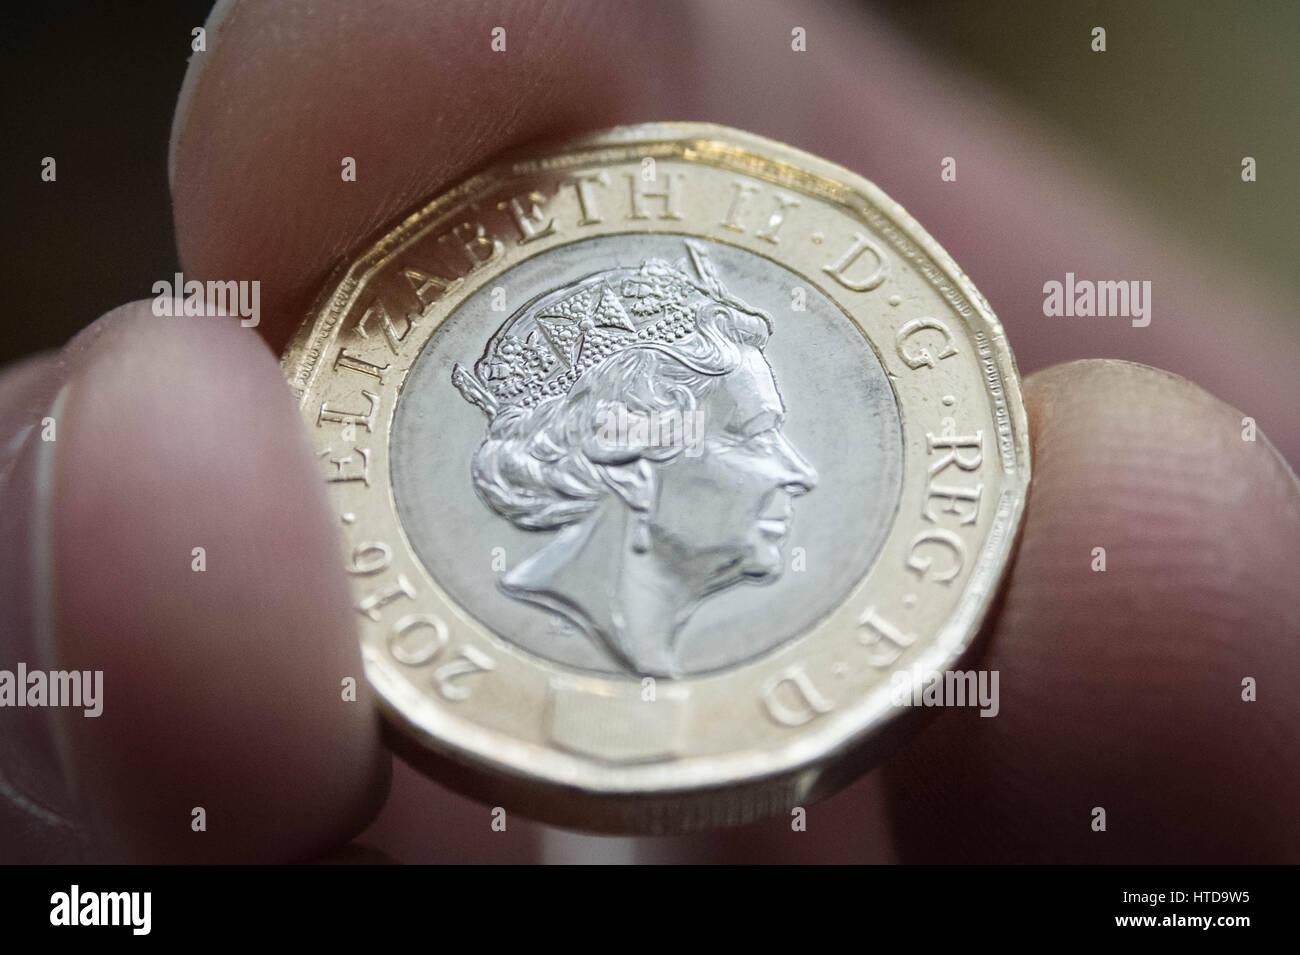 London Uk 9 März 2017 Neue 1 Pfund Münzen In London Assay Office